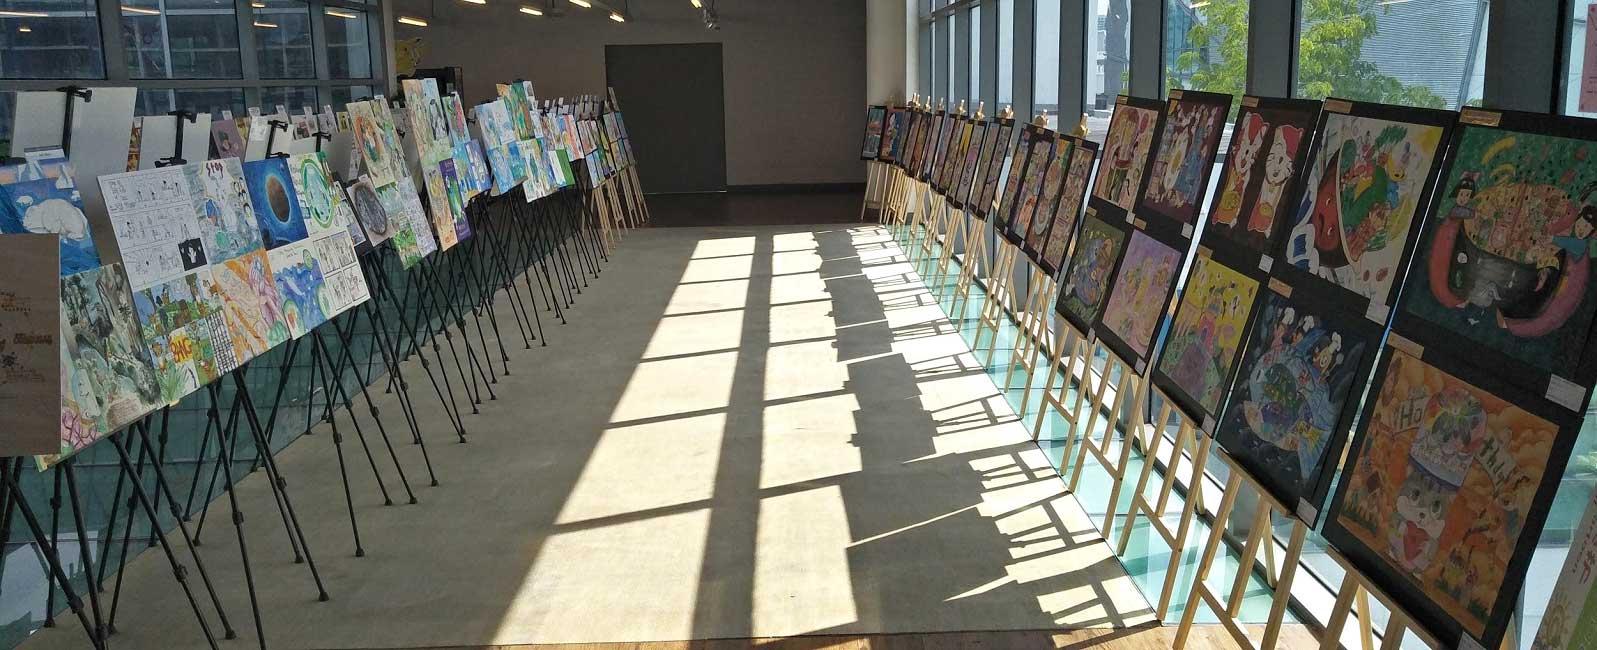 150 artworks from the winners of the Singapore International Original Comics Competition (SGIOCC), China Hangzhou International Cartoon Festival (CICAF) Singapore section.